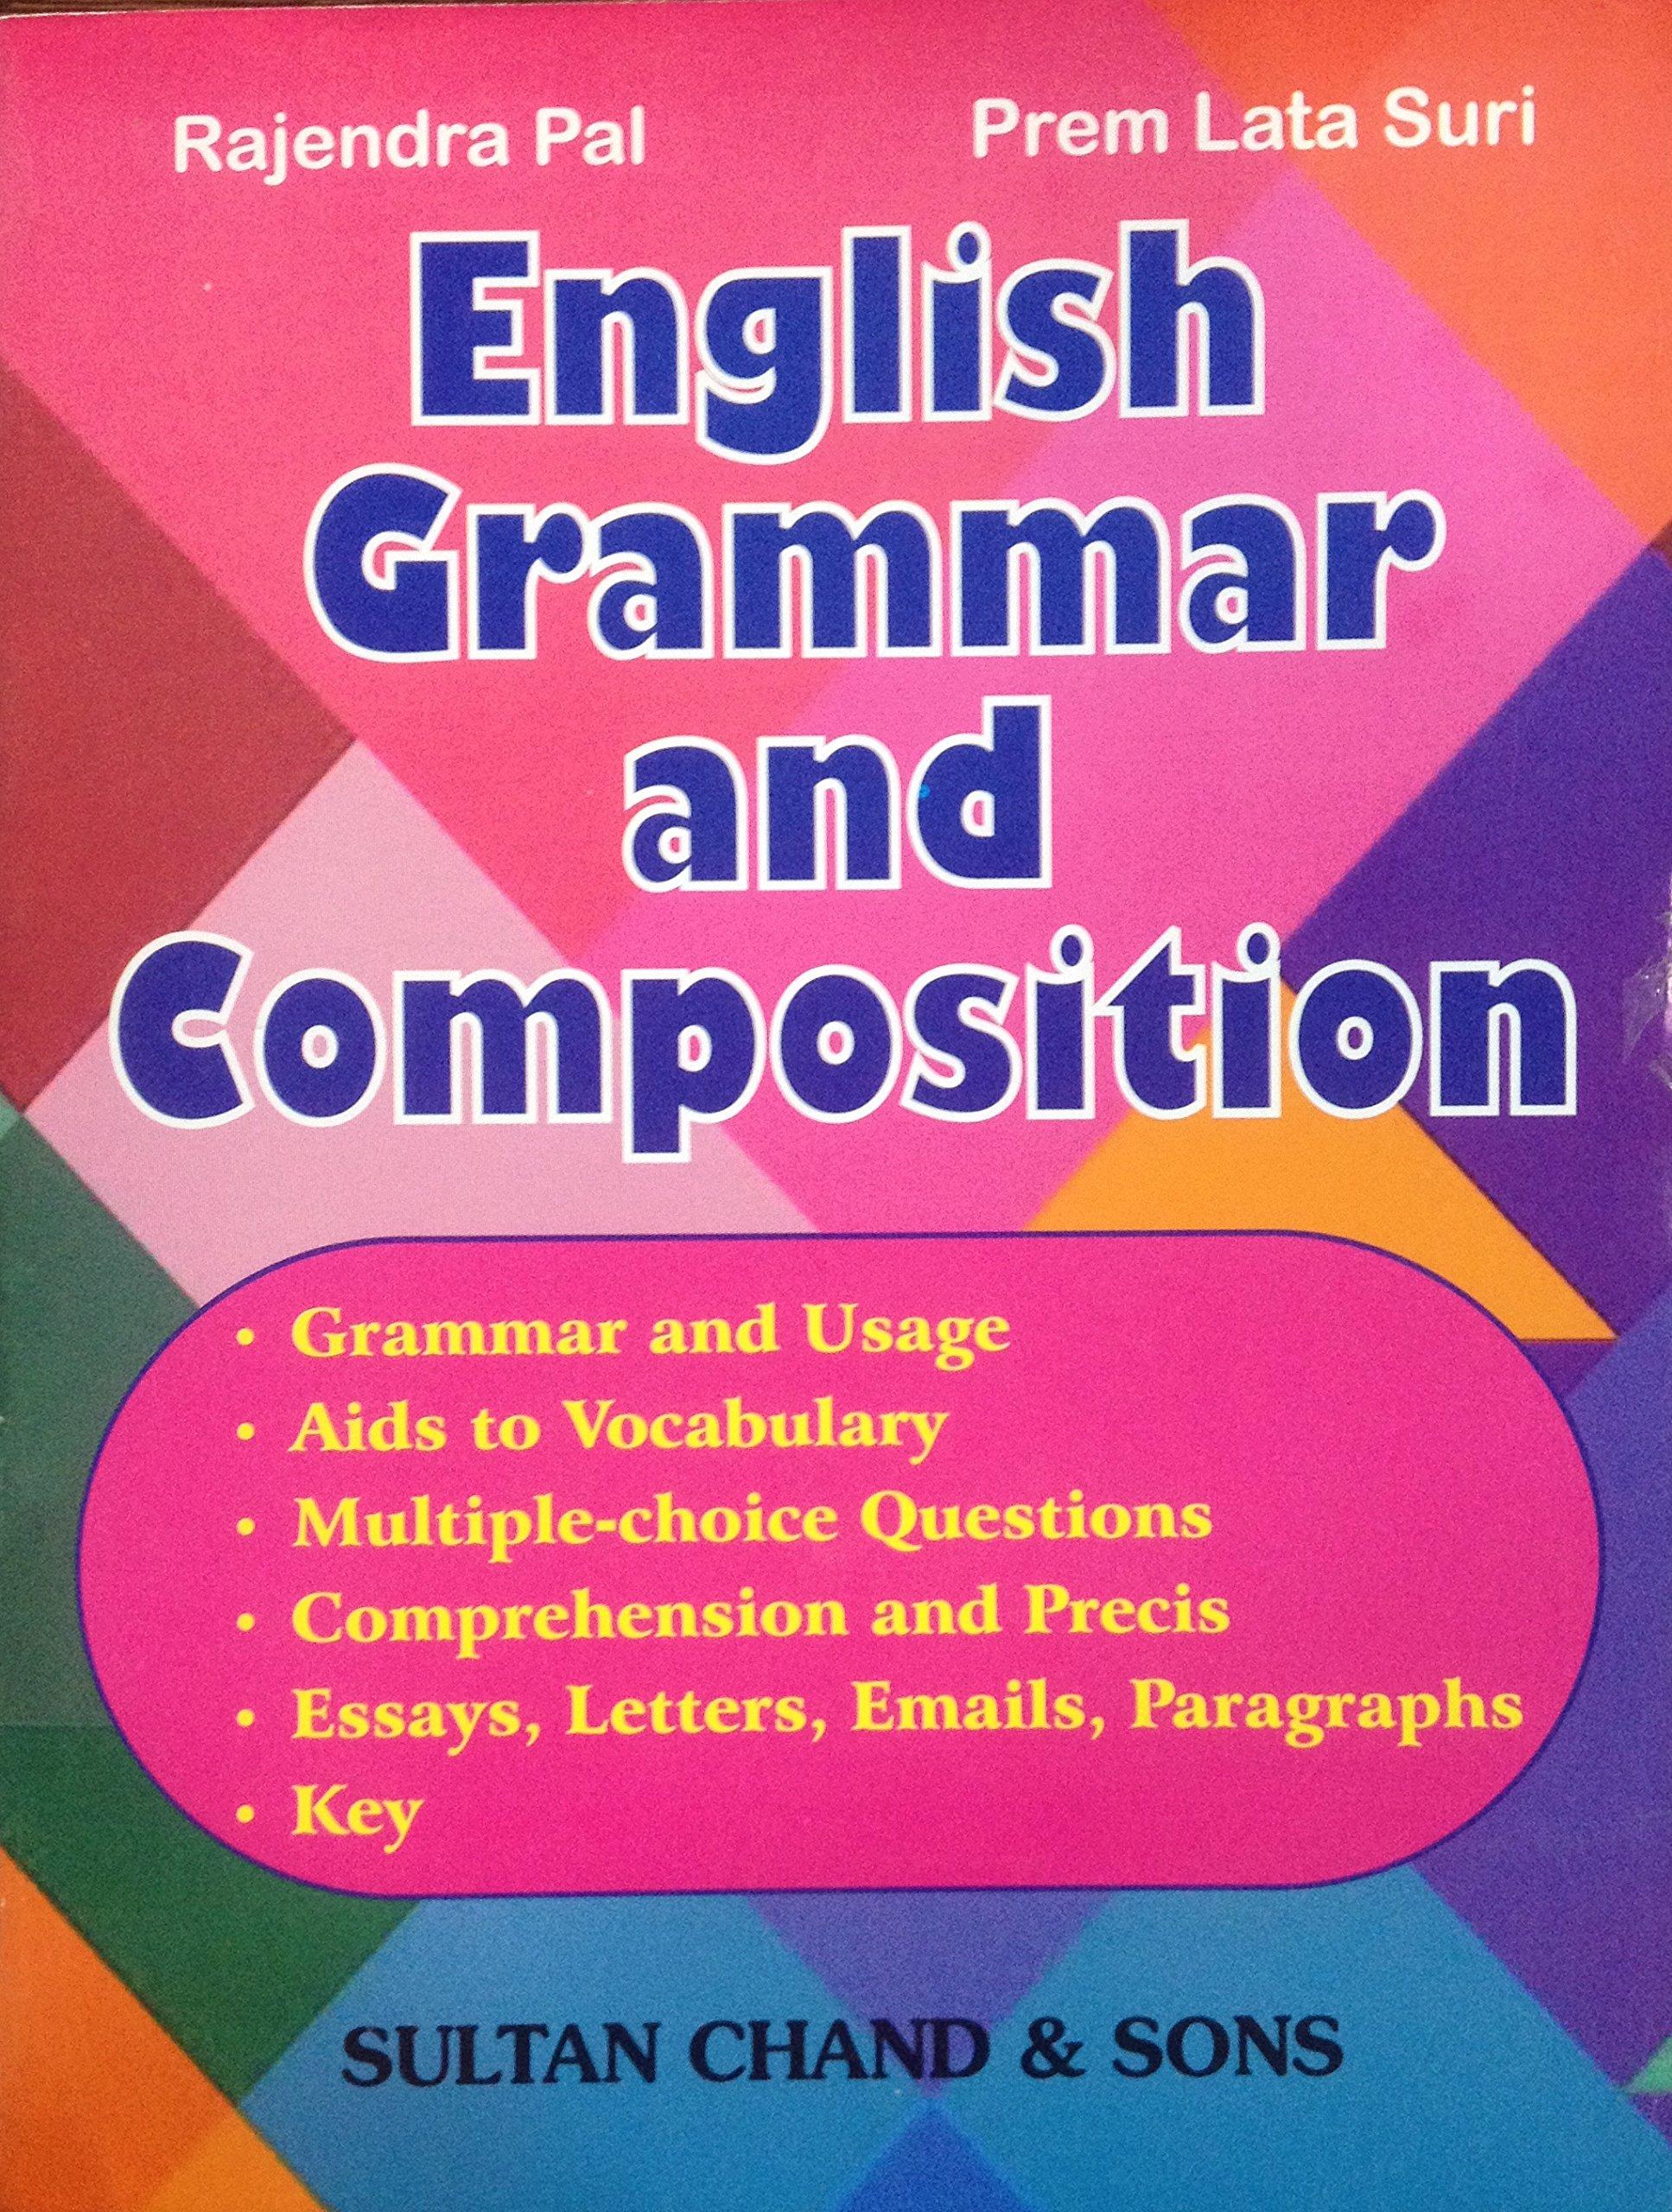 In marathi english grammar book